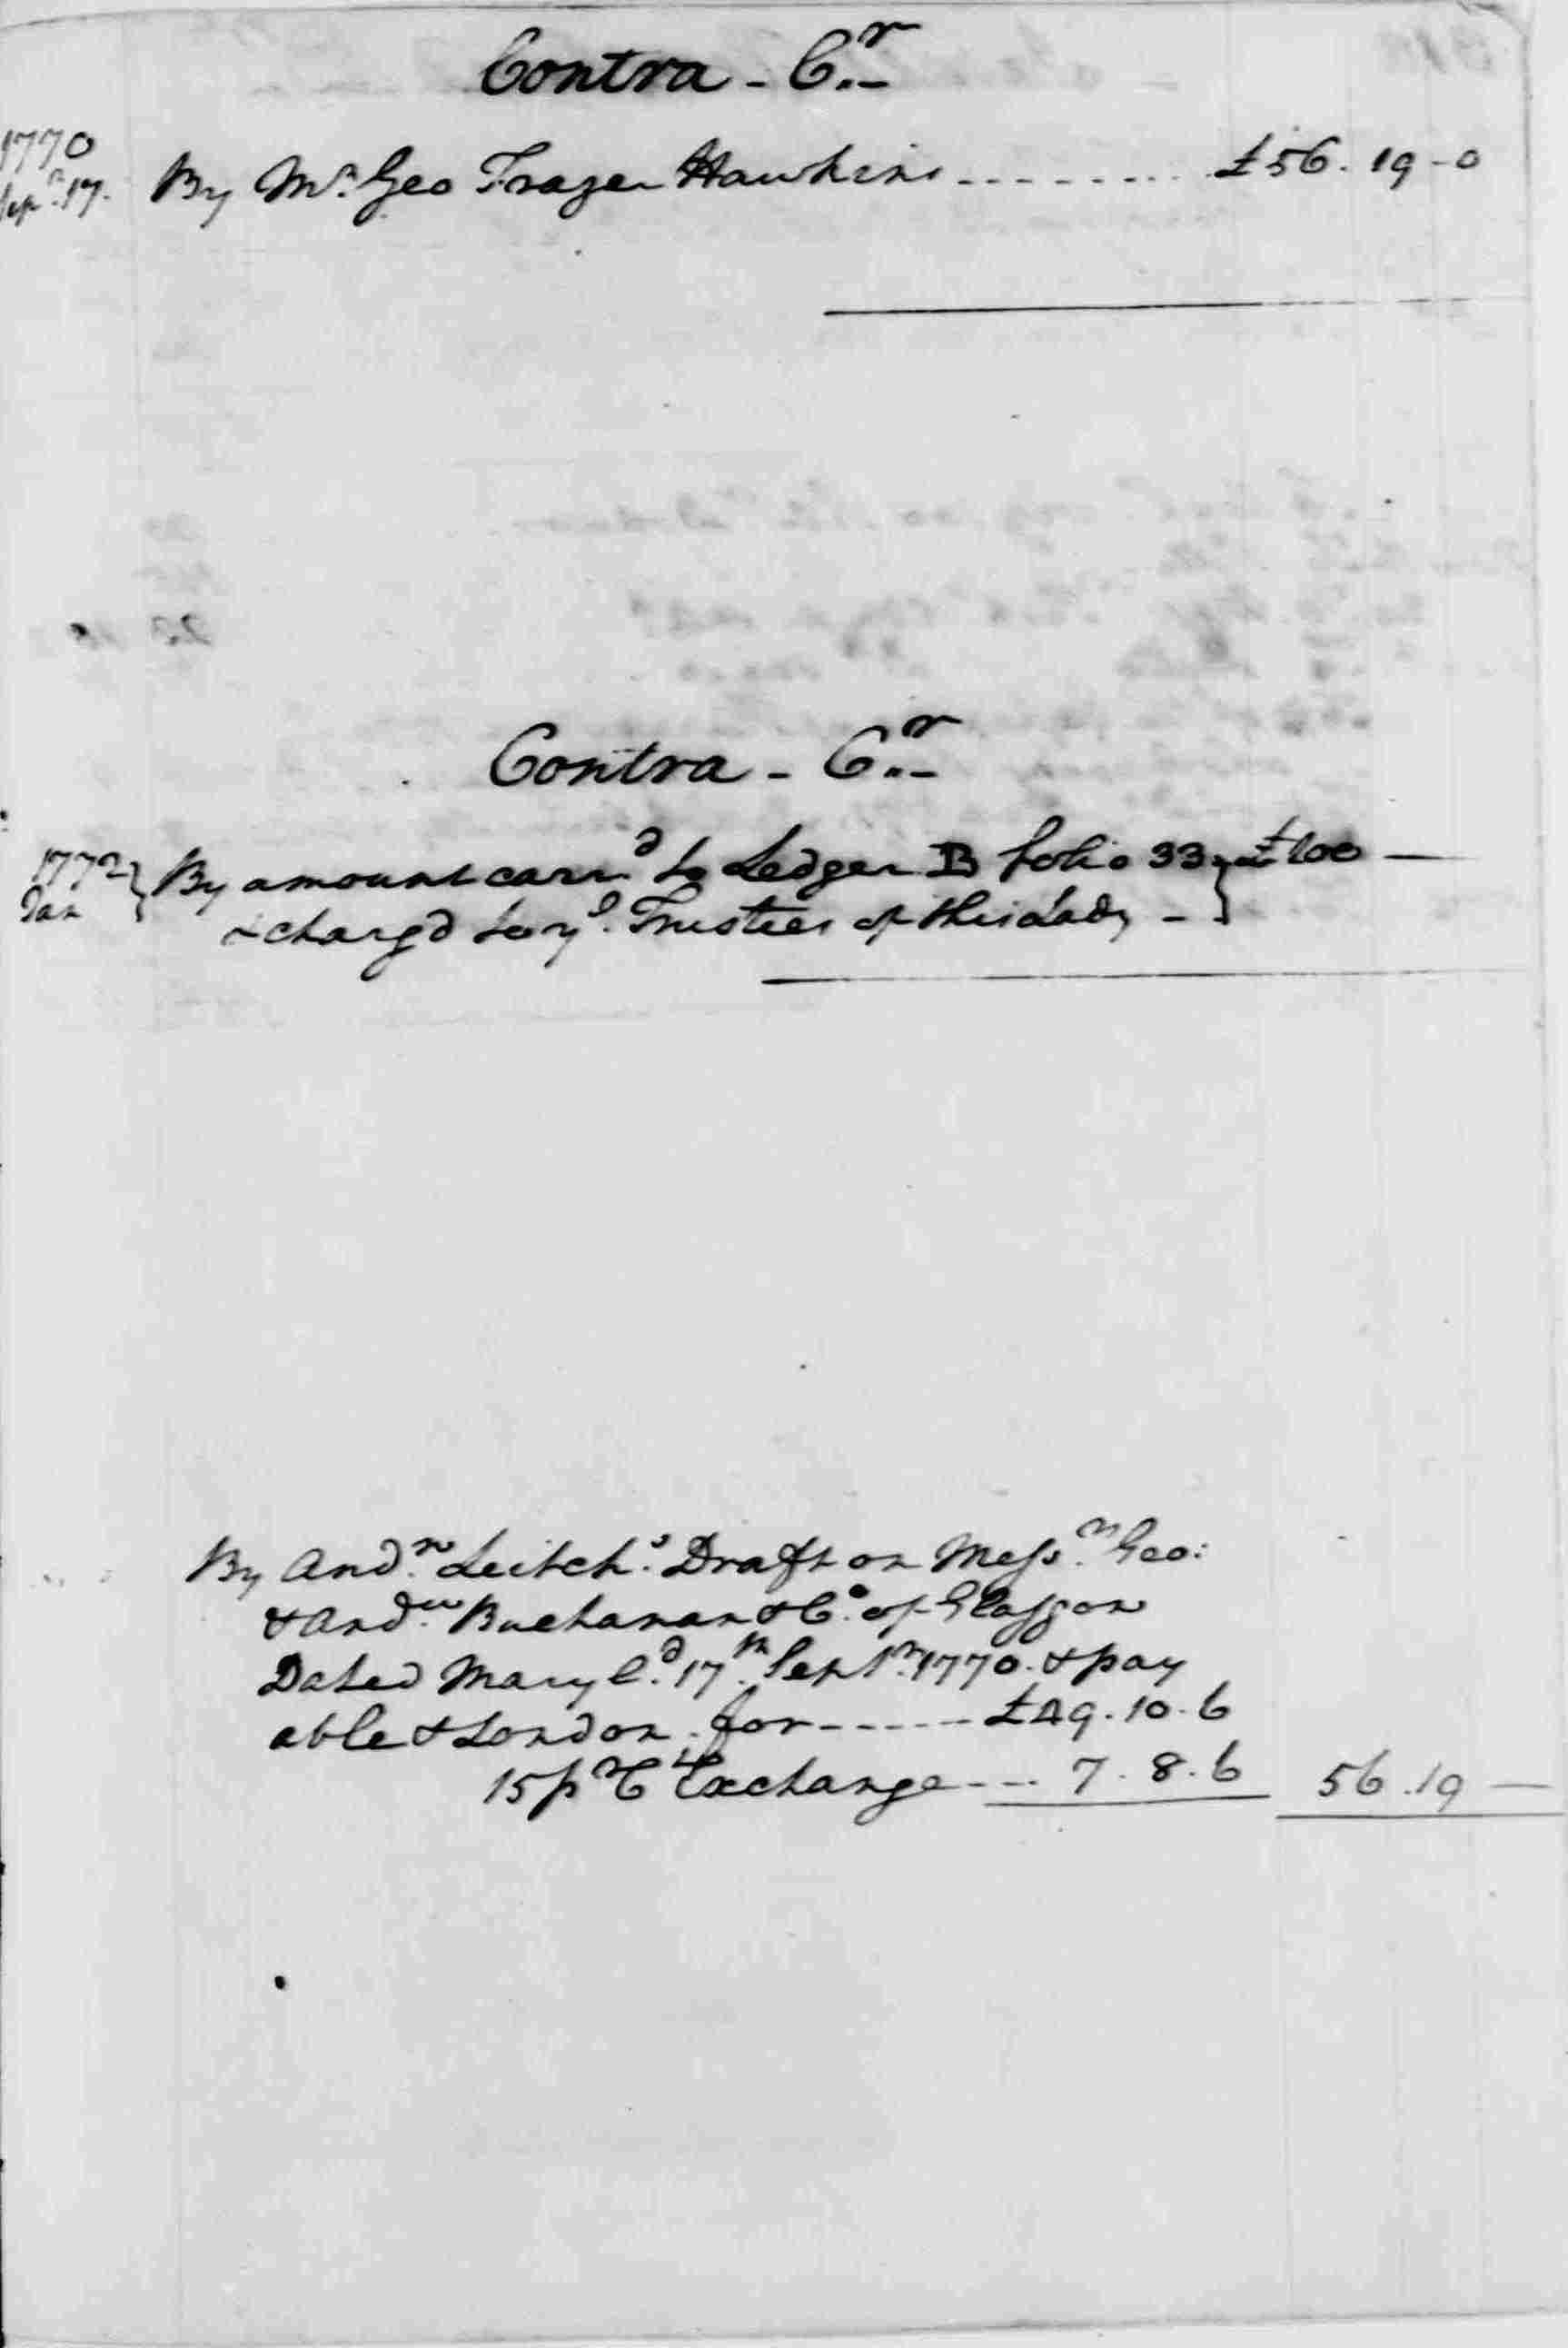 Ledger A, folio 311, right side